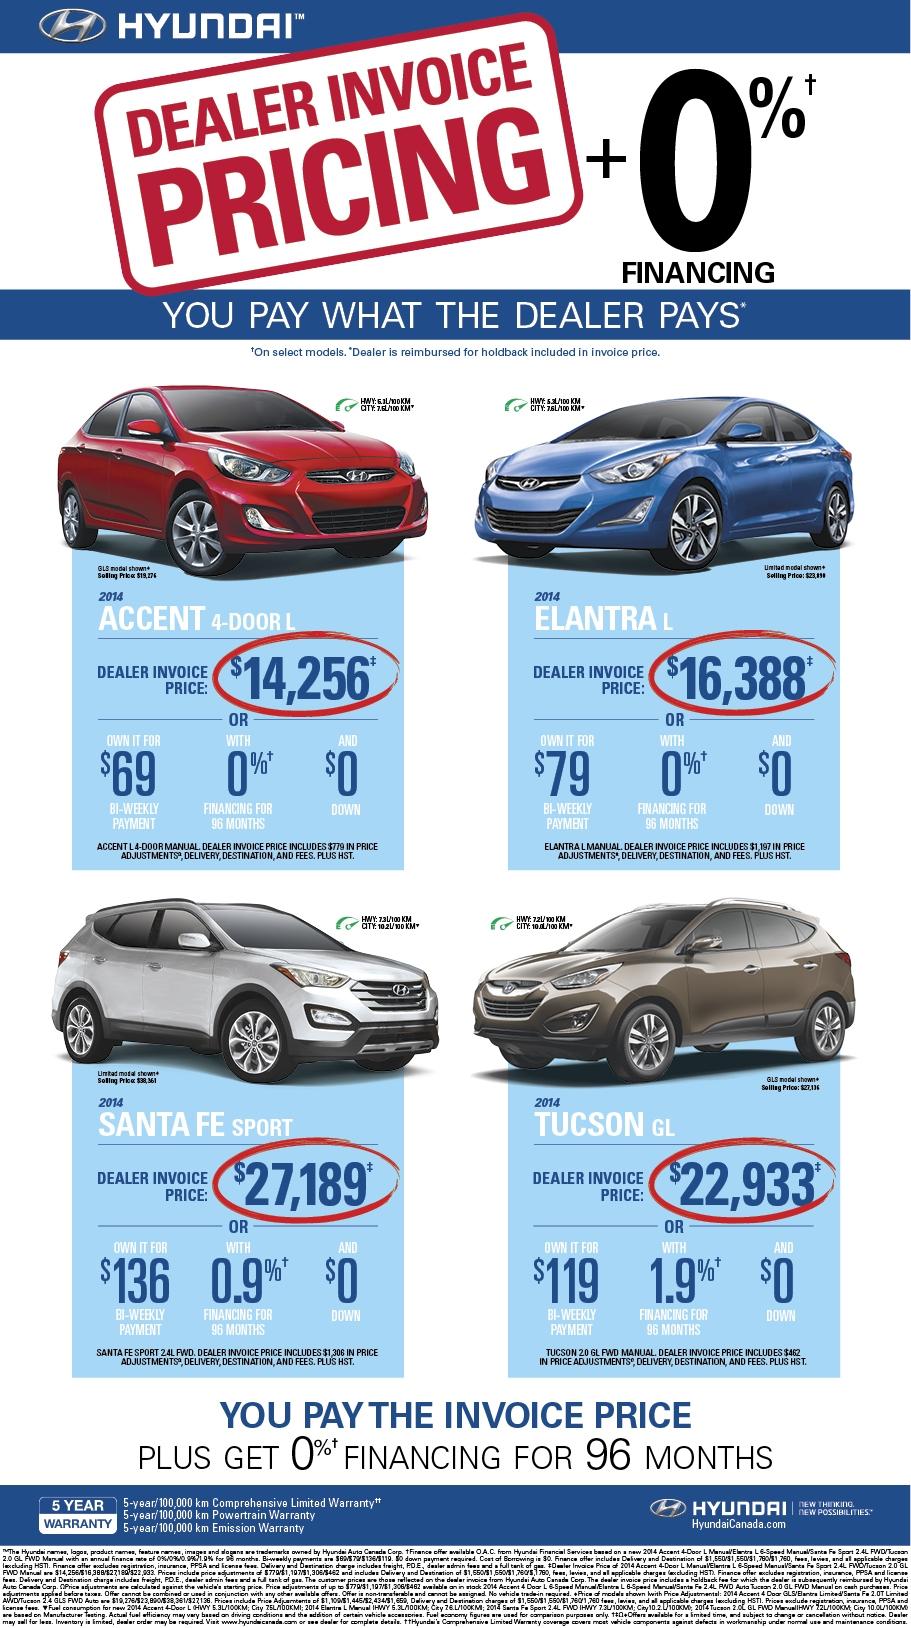 stouffville hyundai new hyundai dealership in stouffville on hyundai invoice prices